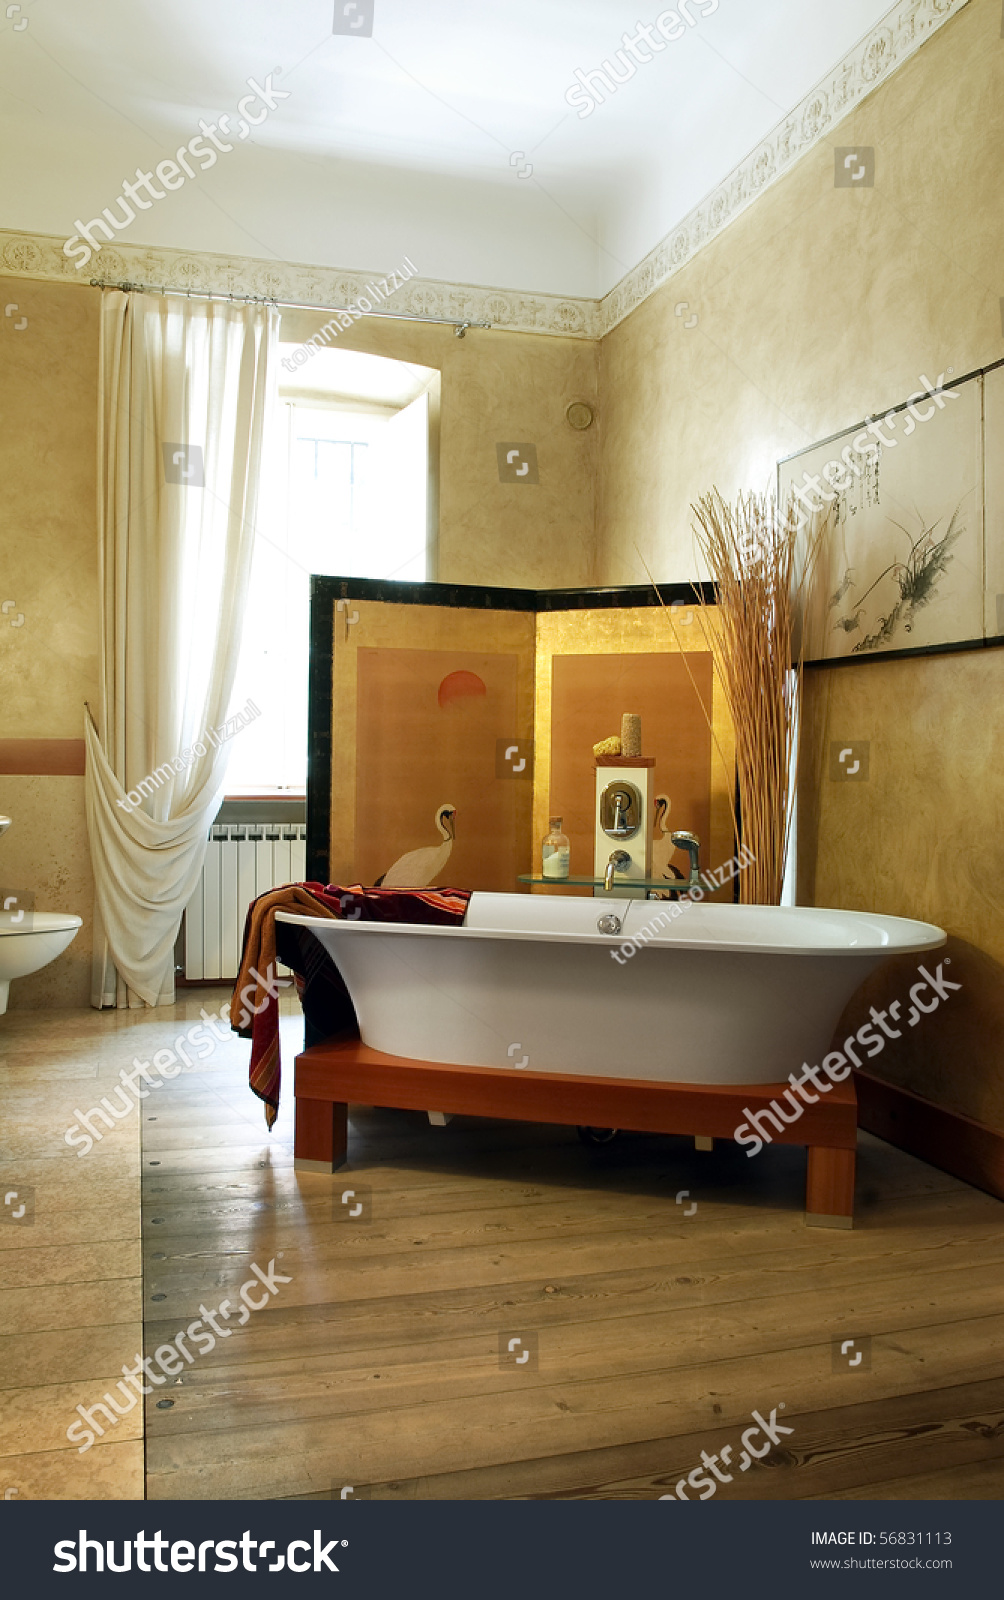 Japanese Style Bathroom Stock Photo (Edit Now) 56831113 - Shutterstock